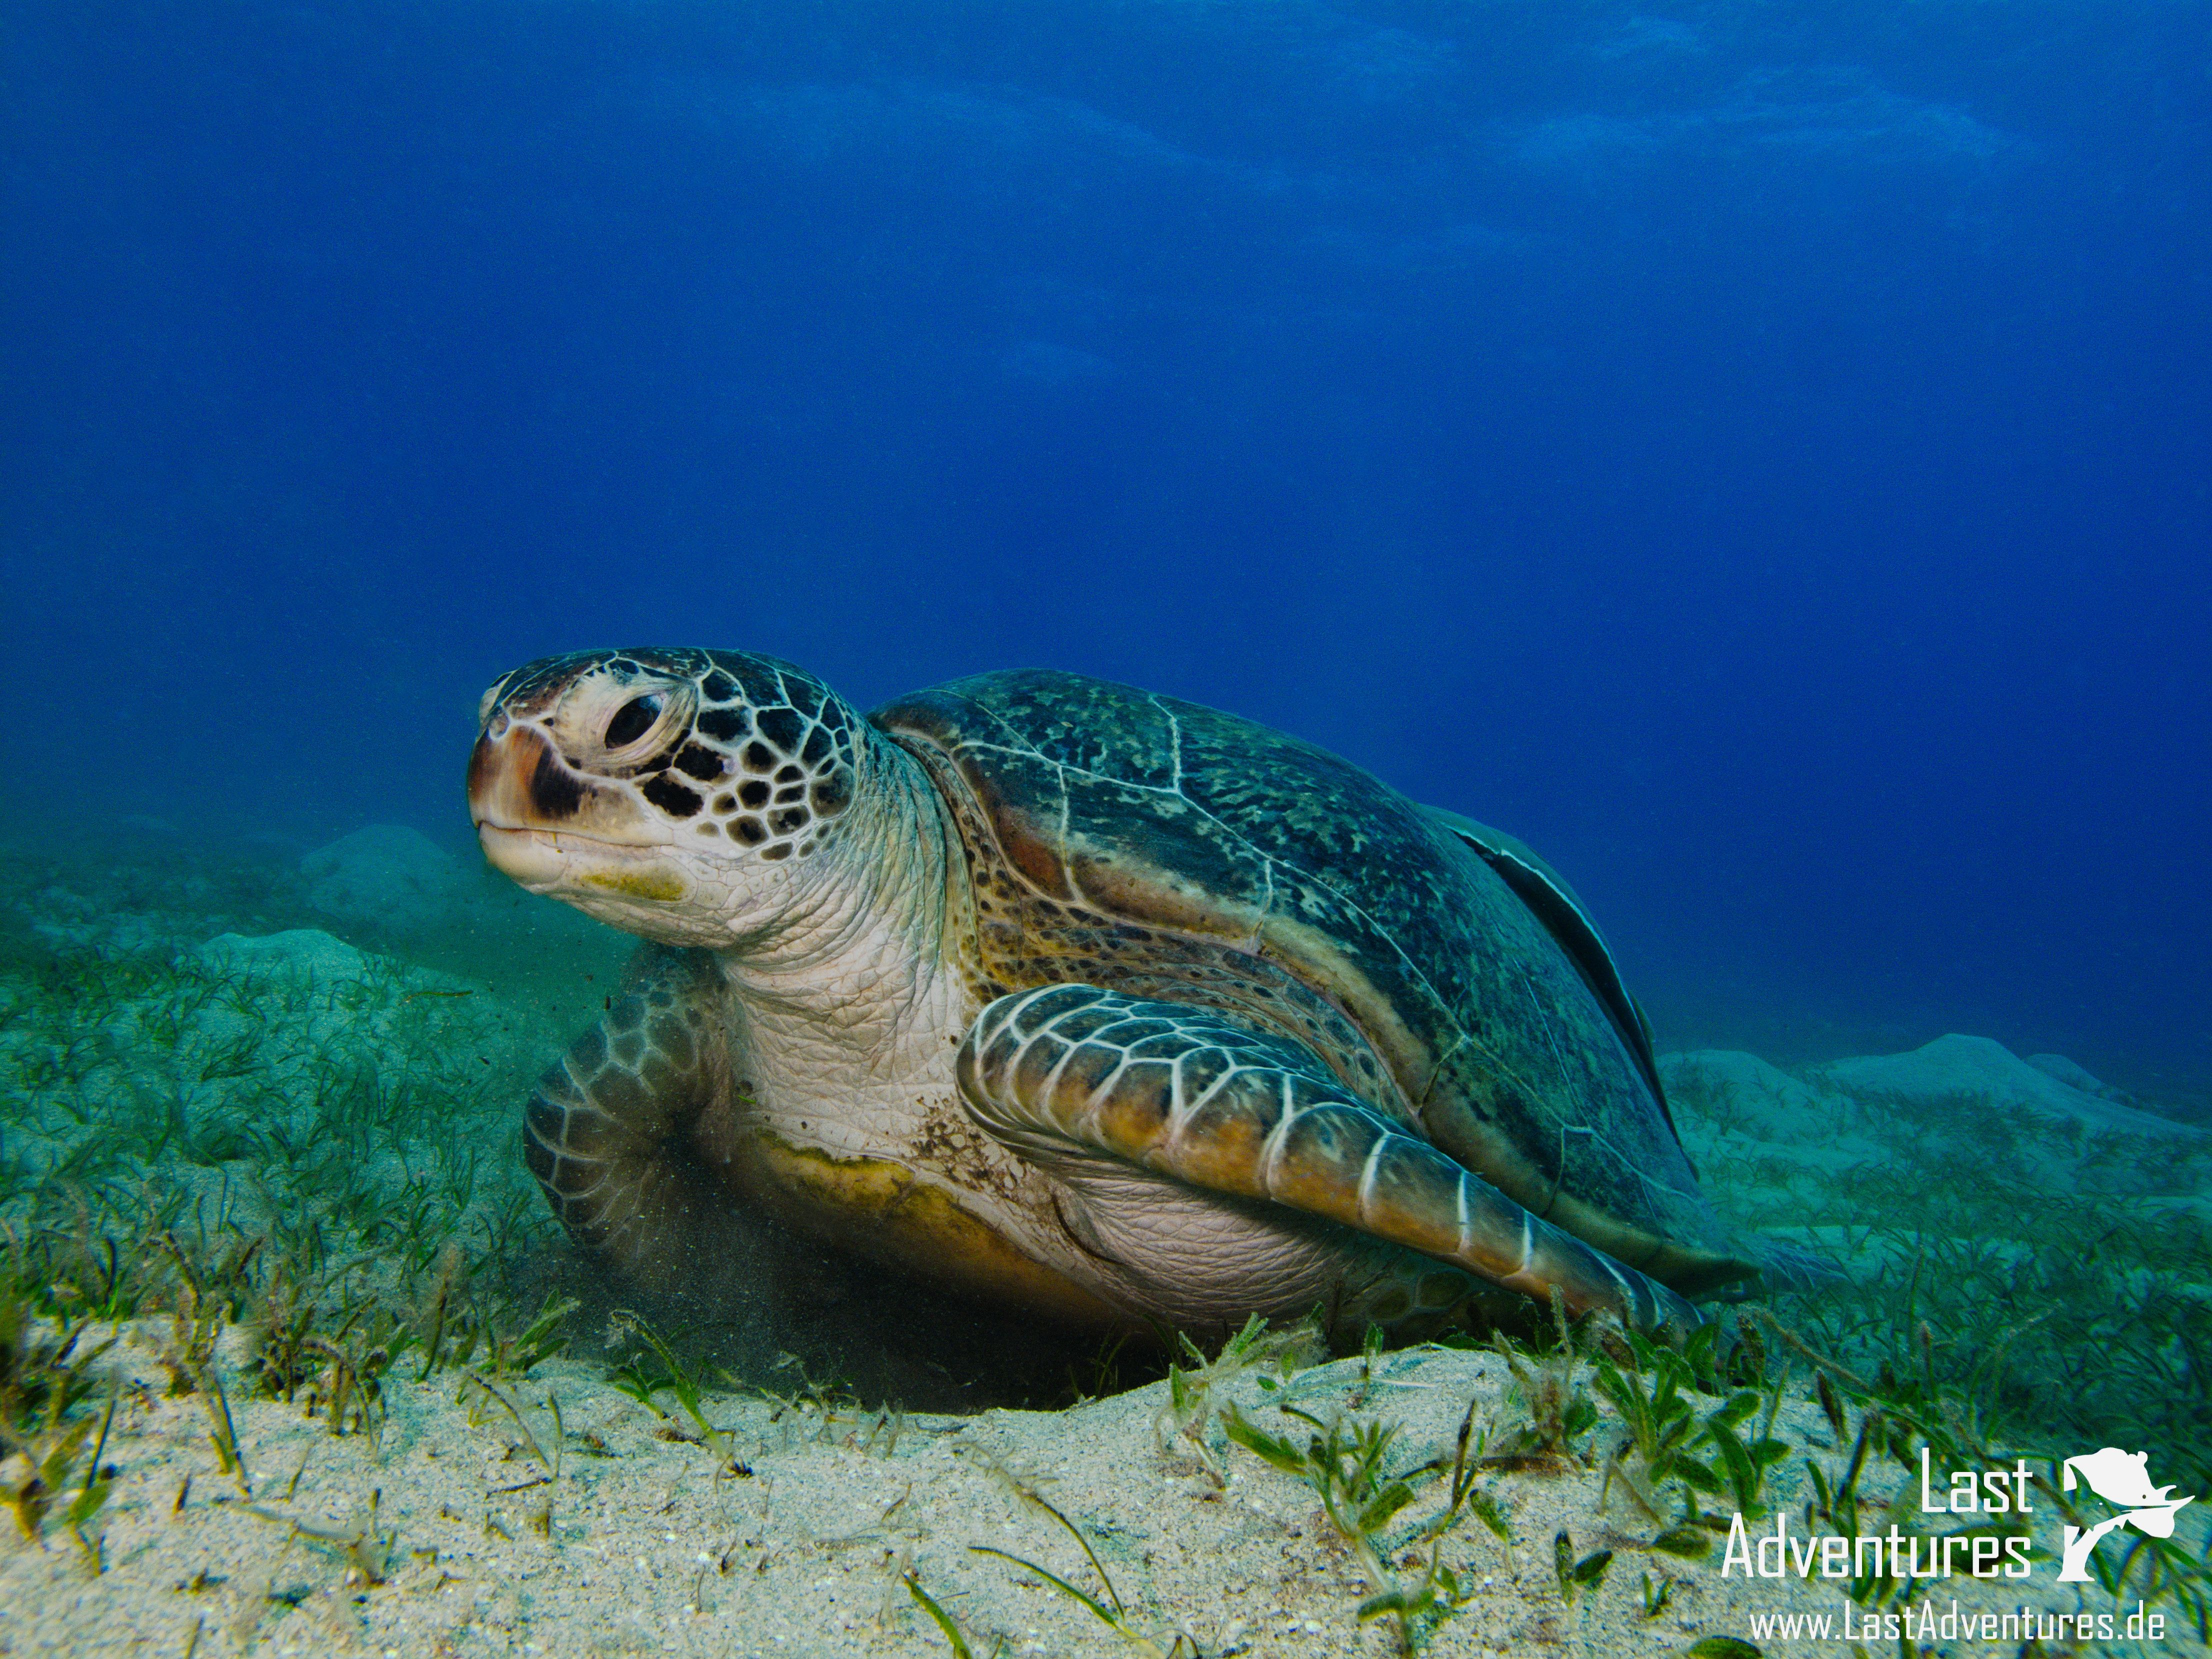 Schildkröte fotografiert in Ägypten #Schildkröte #turtle #ägypten ...